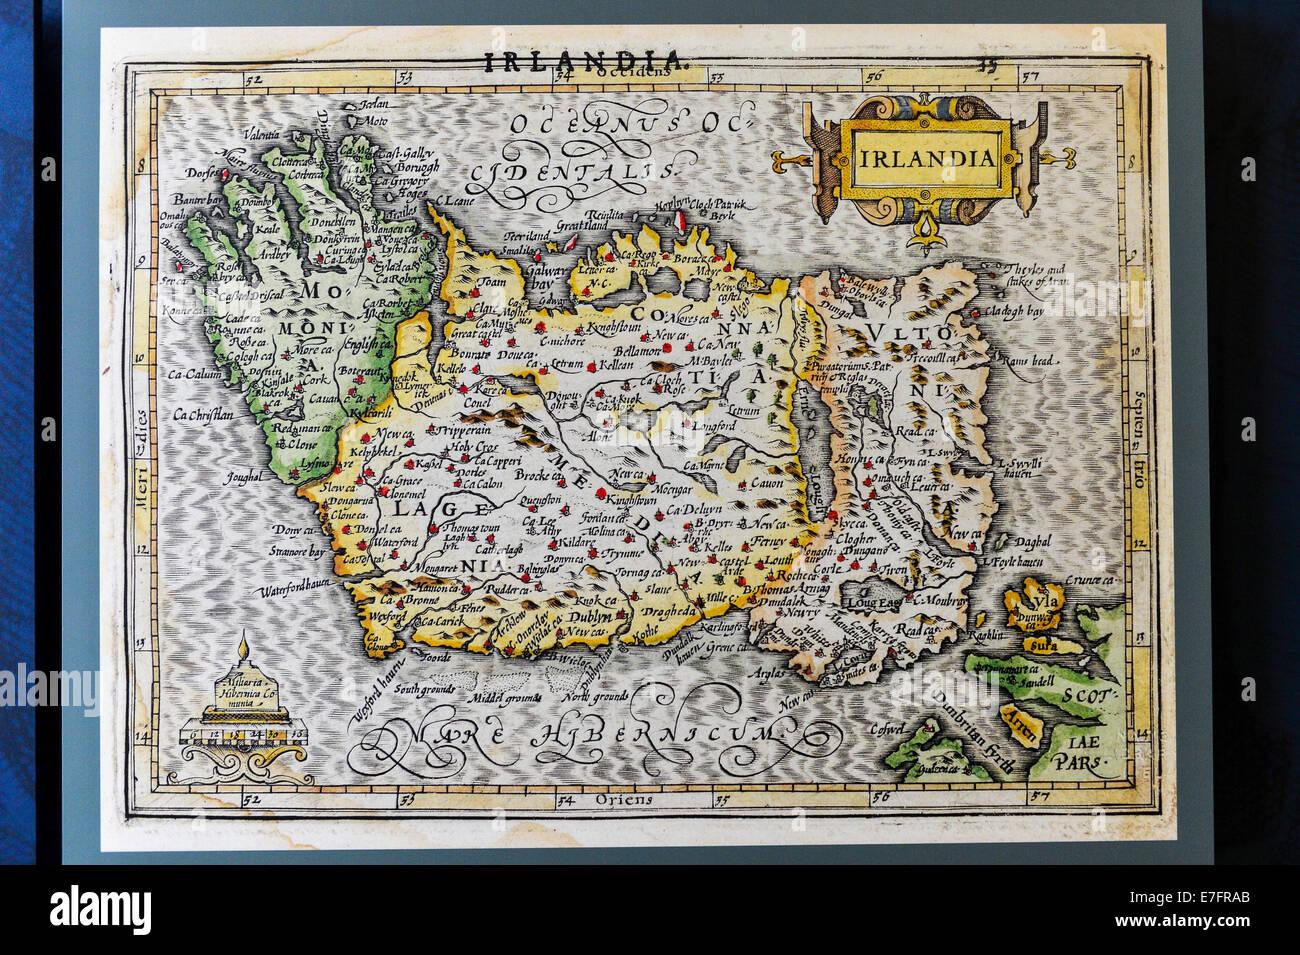 17th century map of Ireland - Stock Image